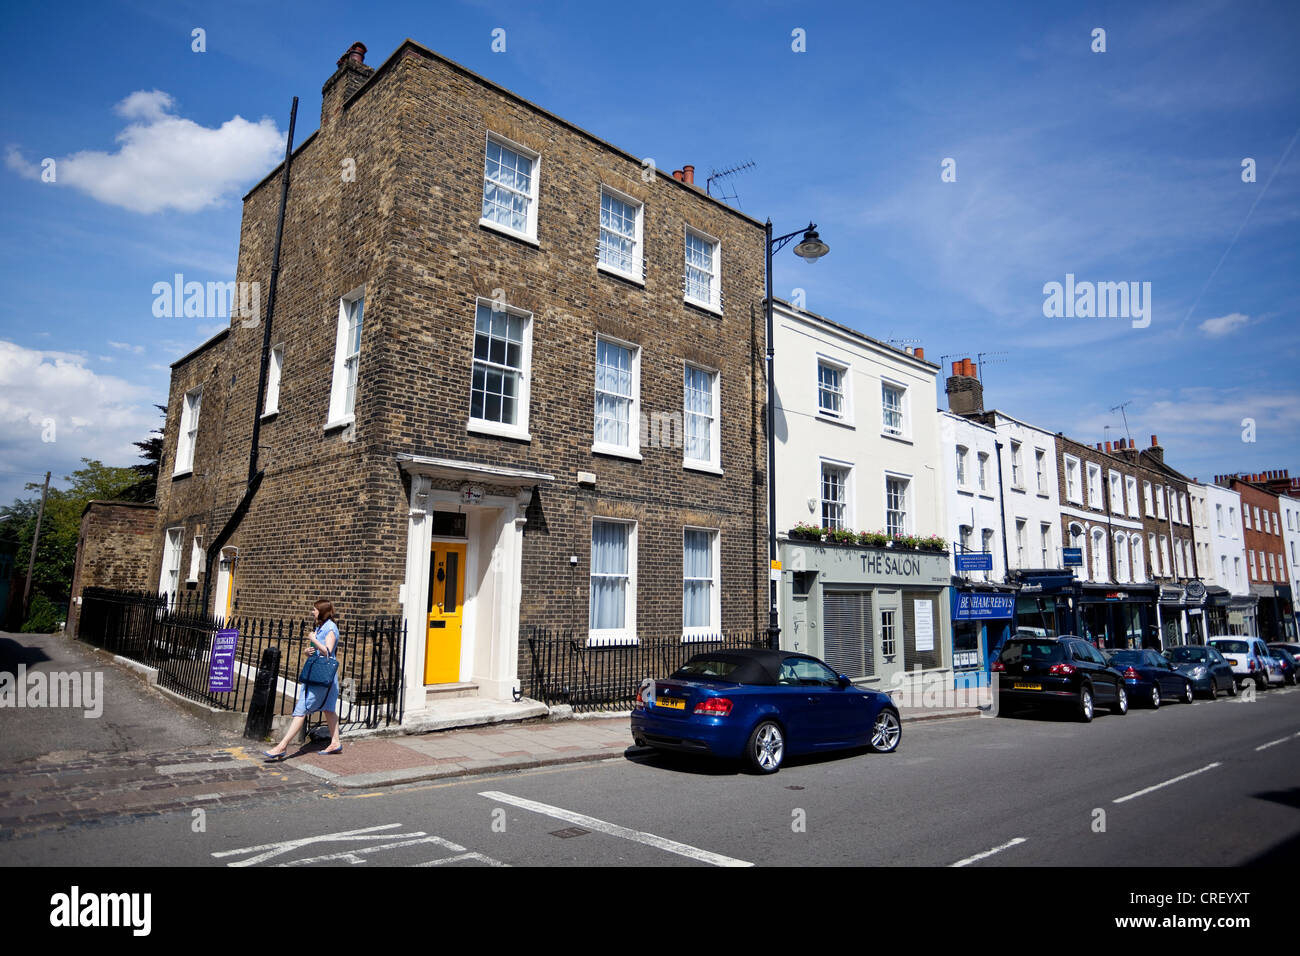 Georgian houses, Highgate High Street, London, N6, England, UK. - Stock Image